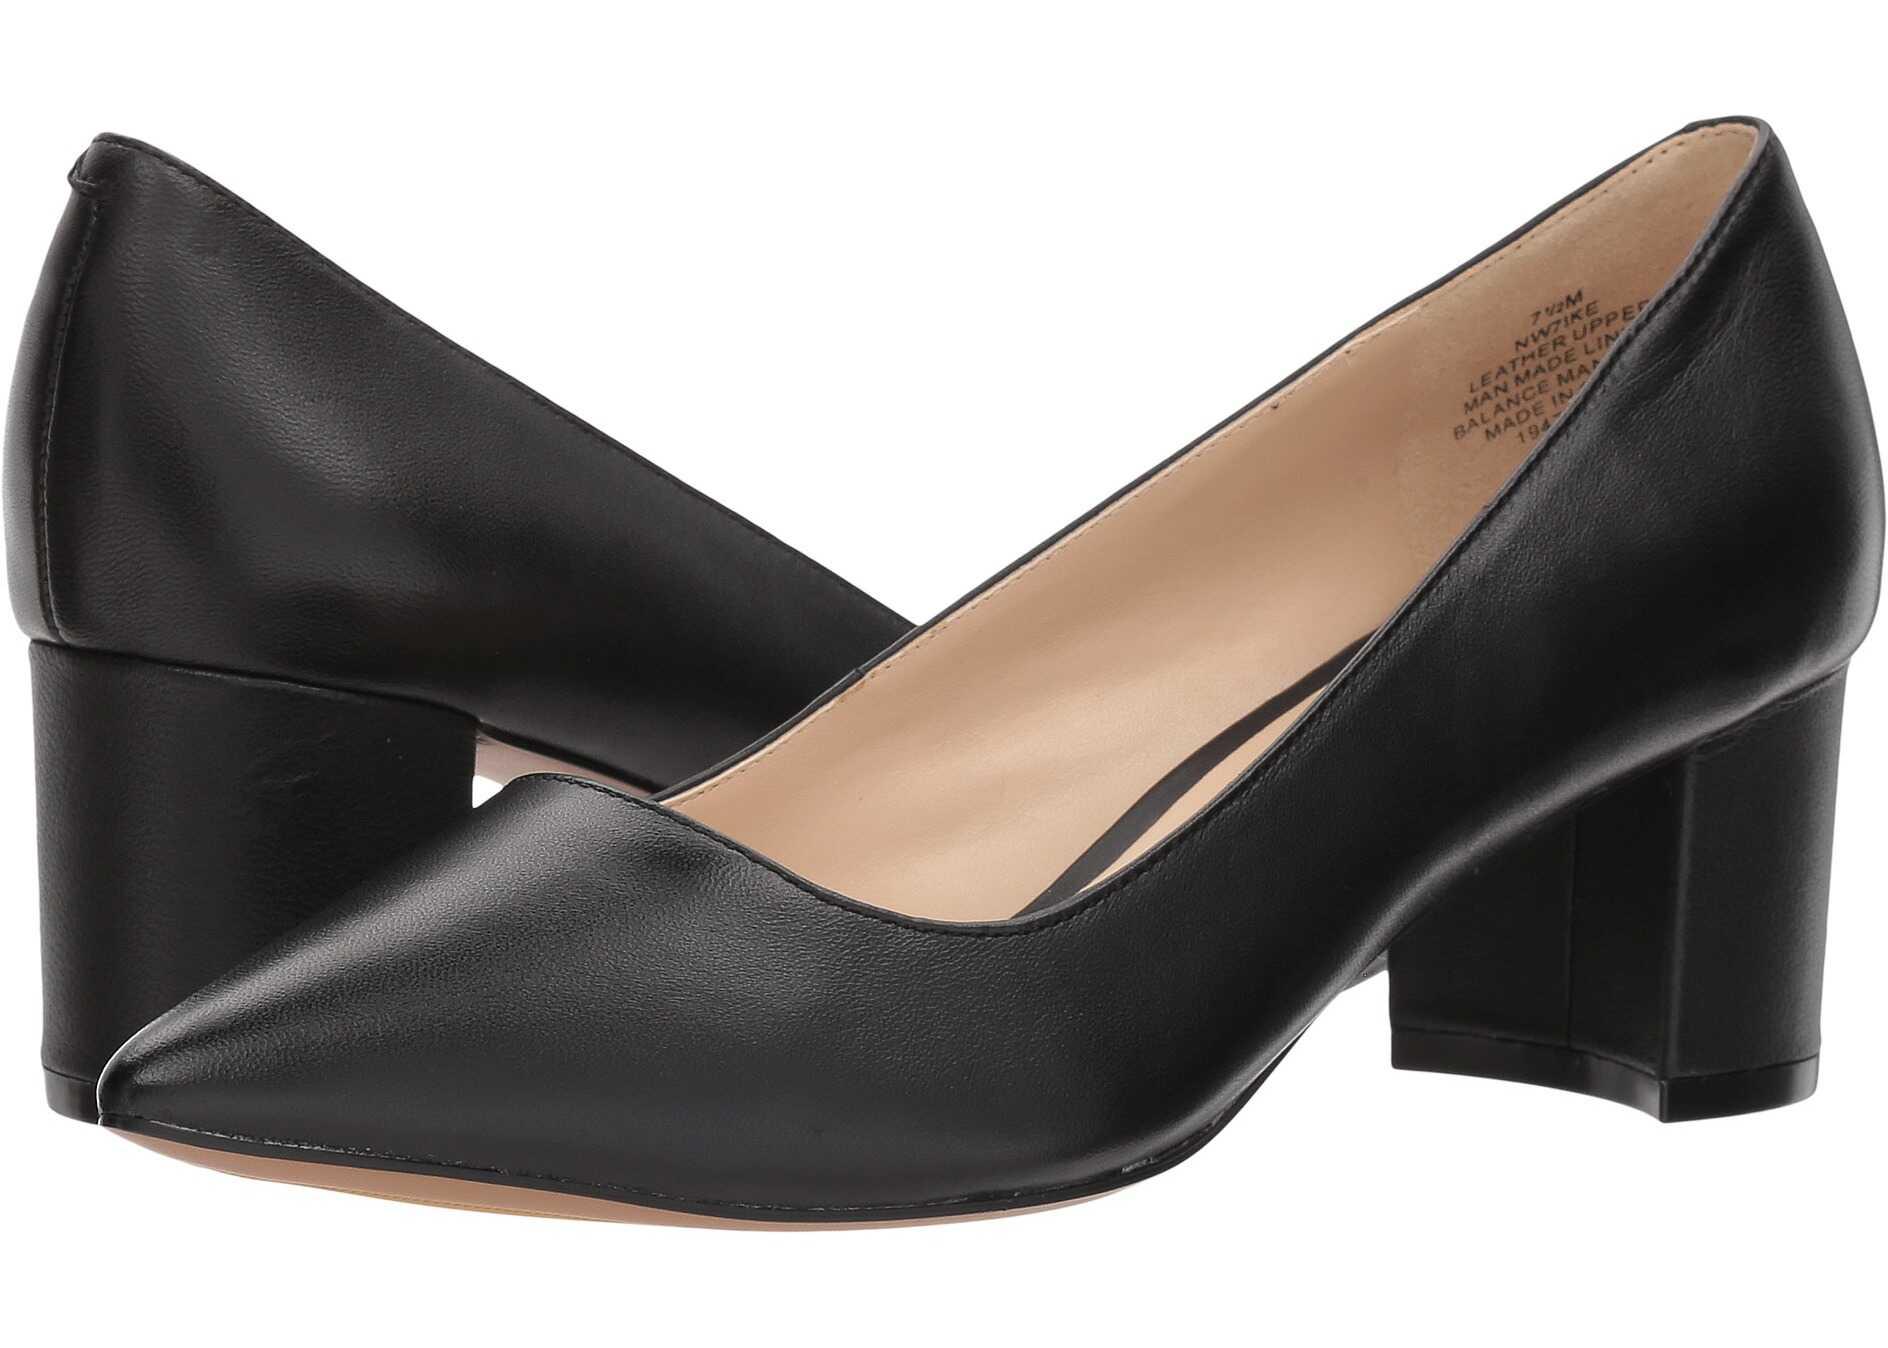 Nine West Ike Black Leather 1